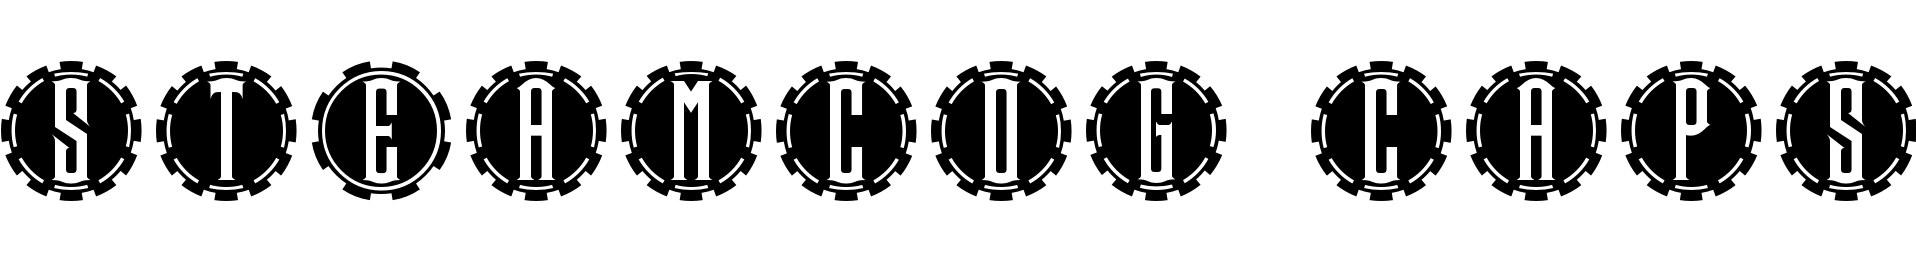 Steamcog Caps